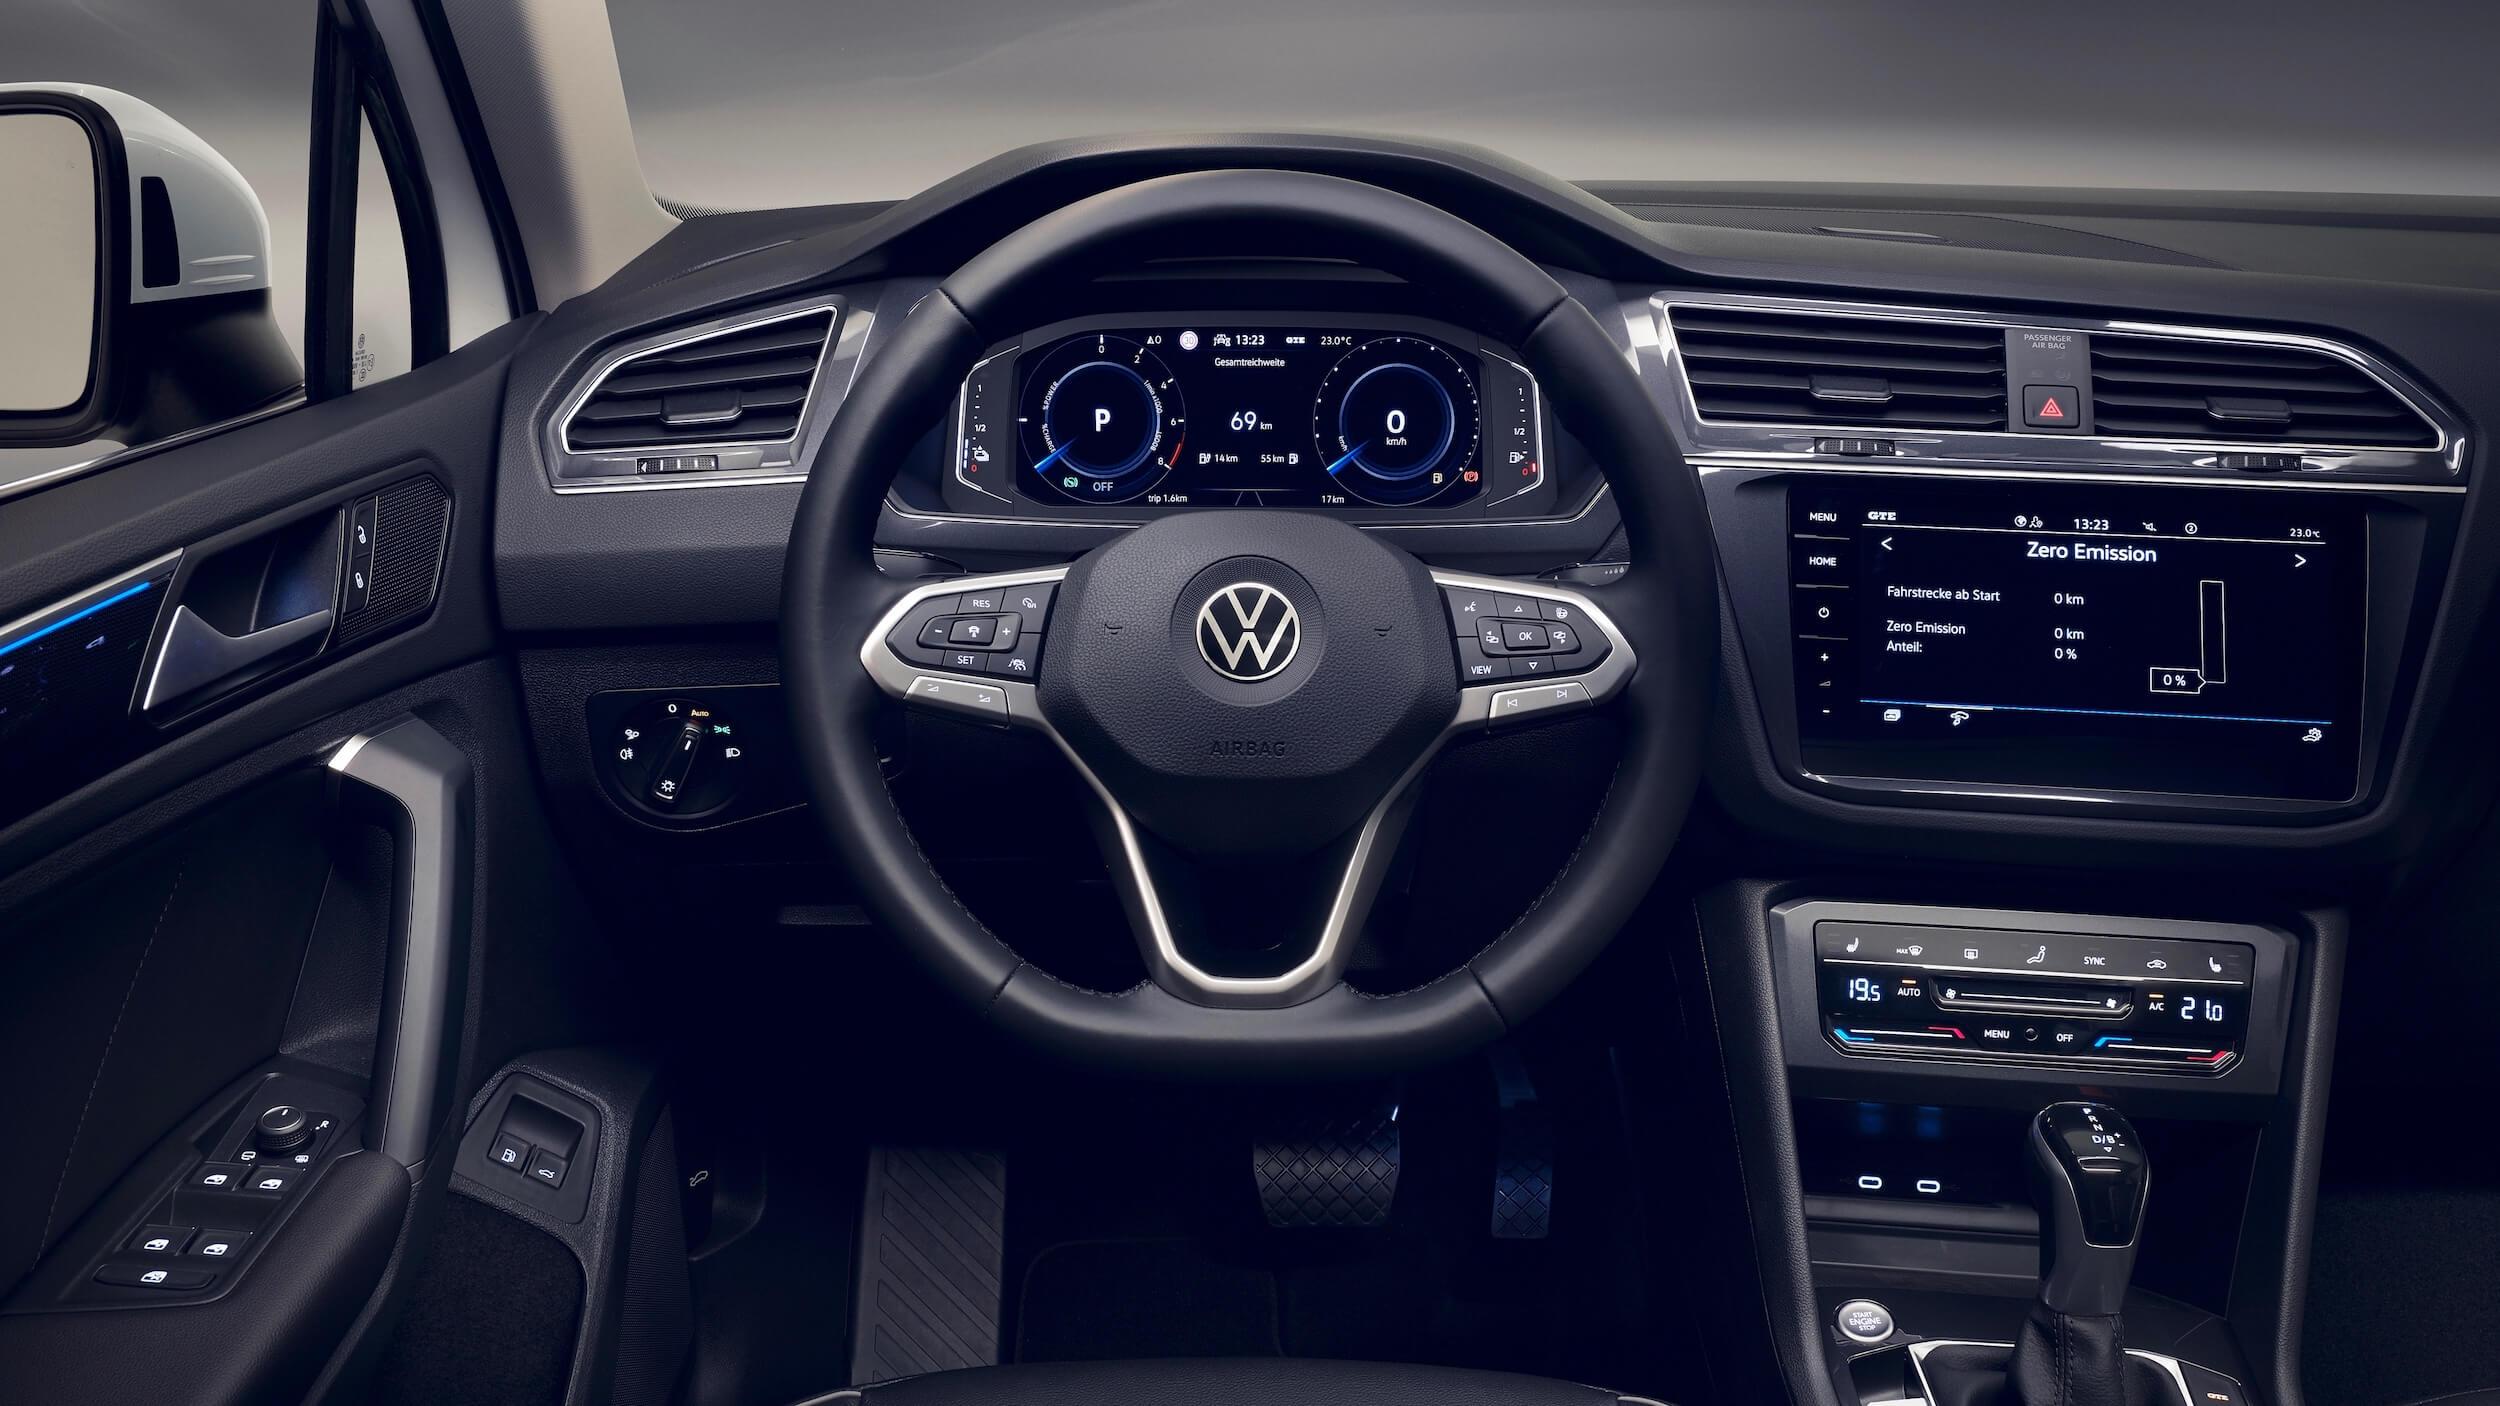 VW Tiguan eHybrid dashboard